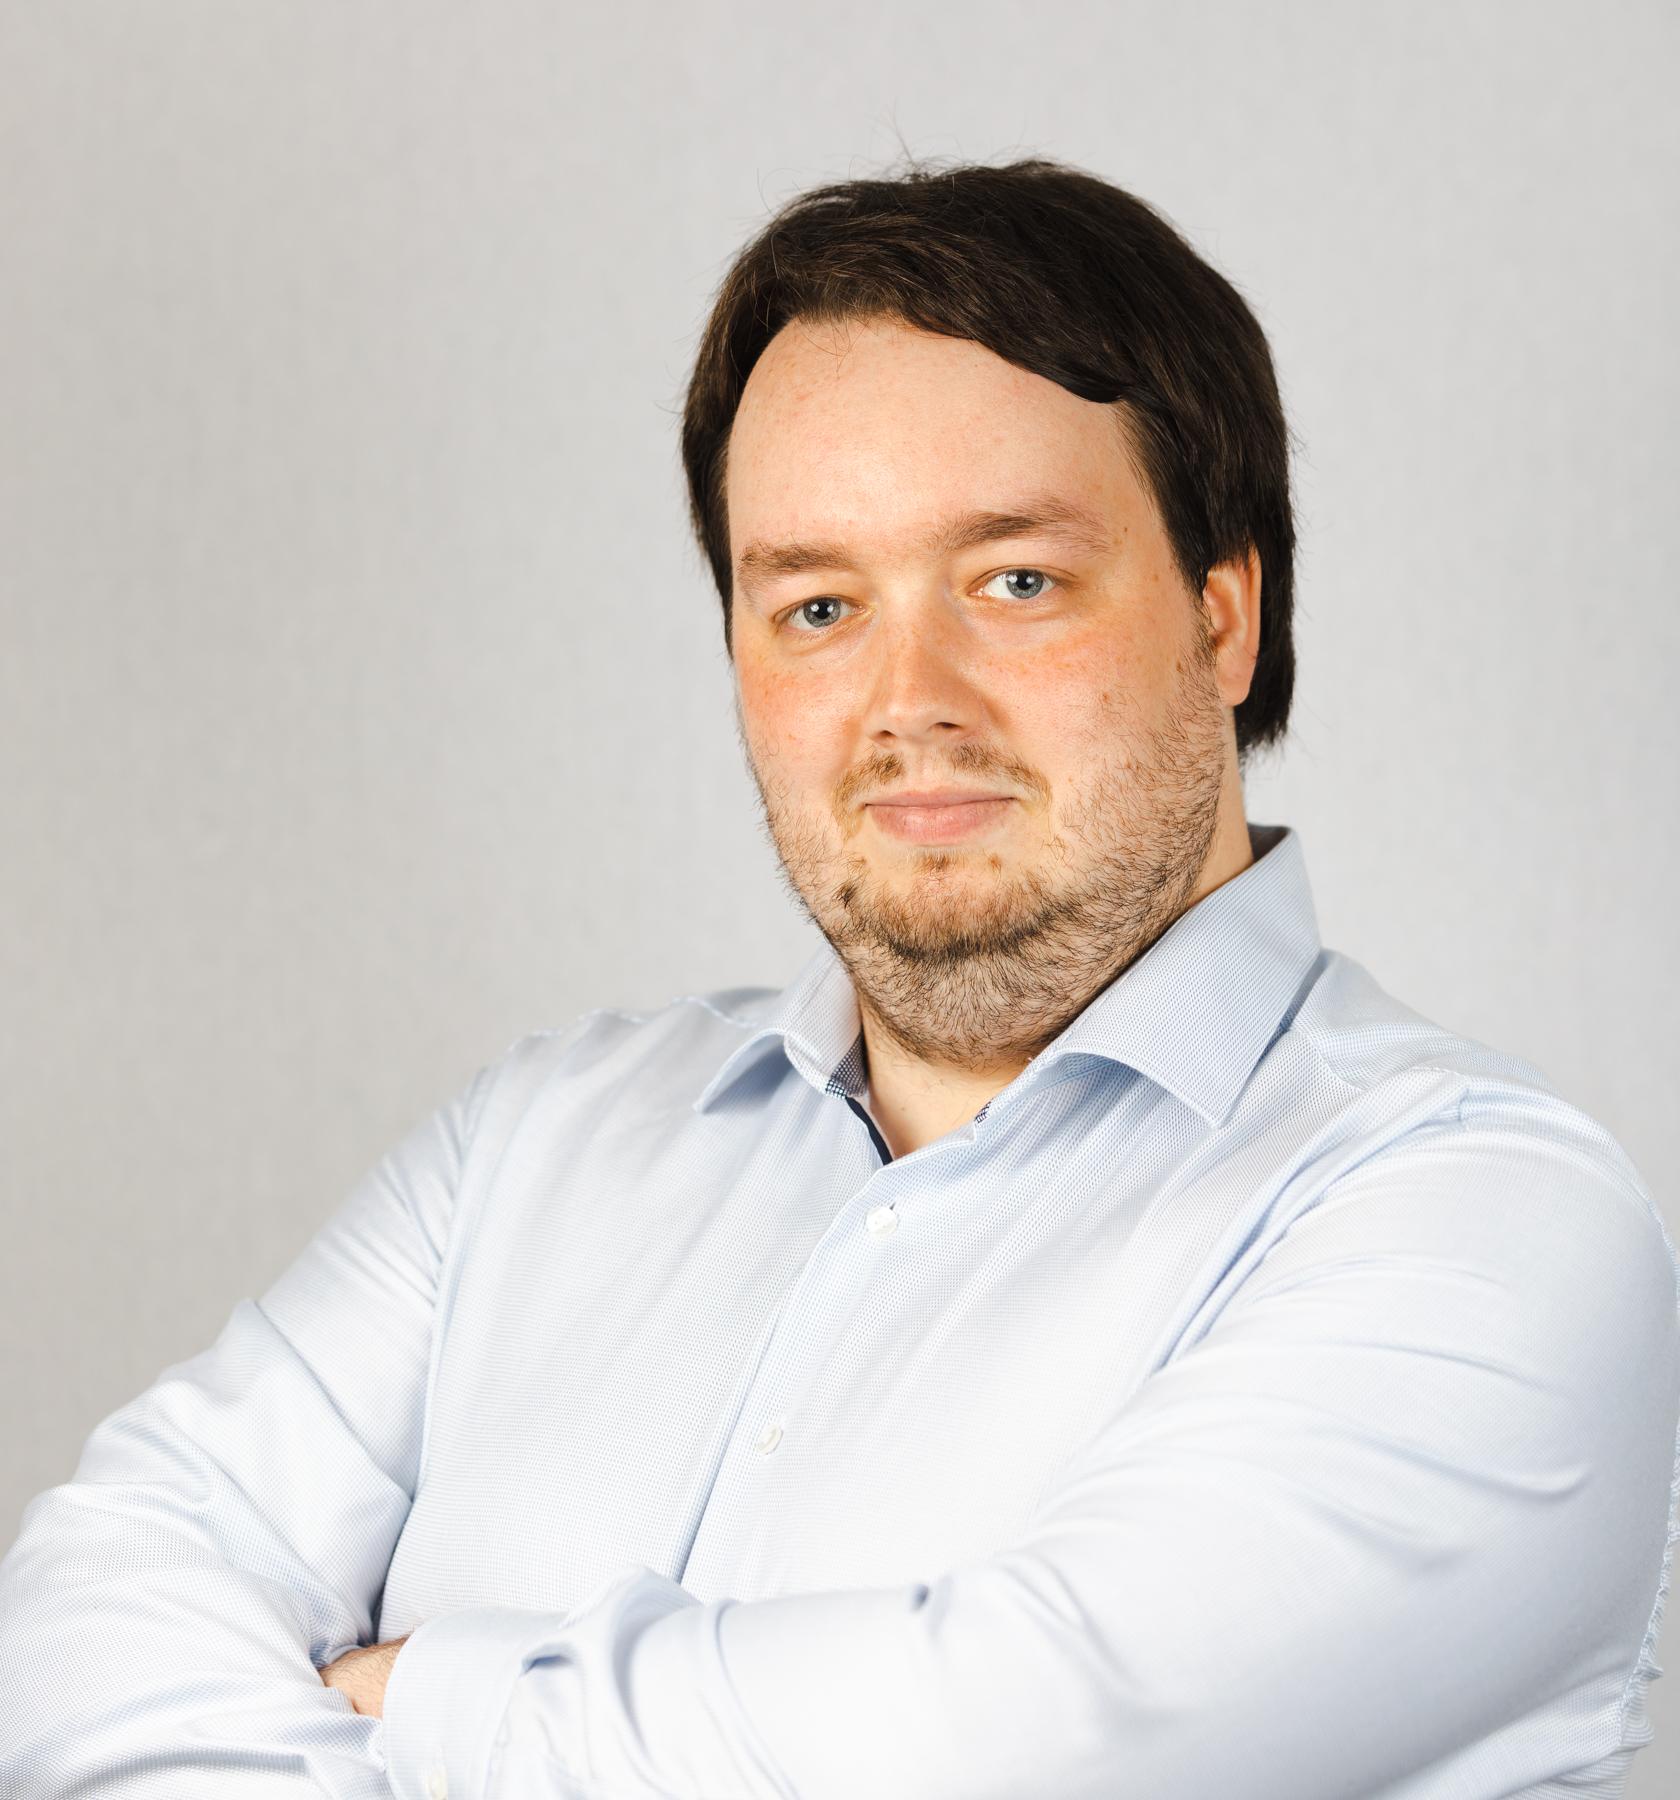 Sebastian Strehl---System Administrator